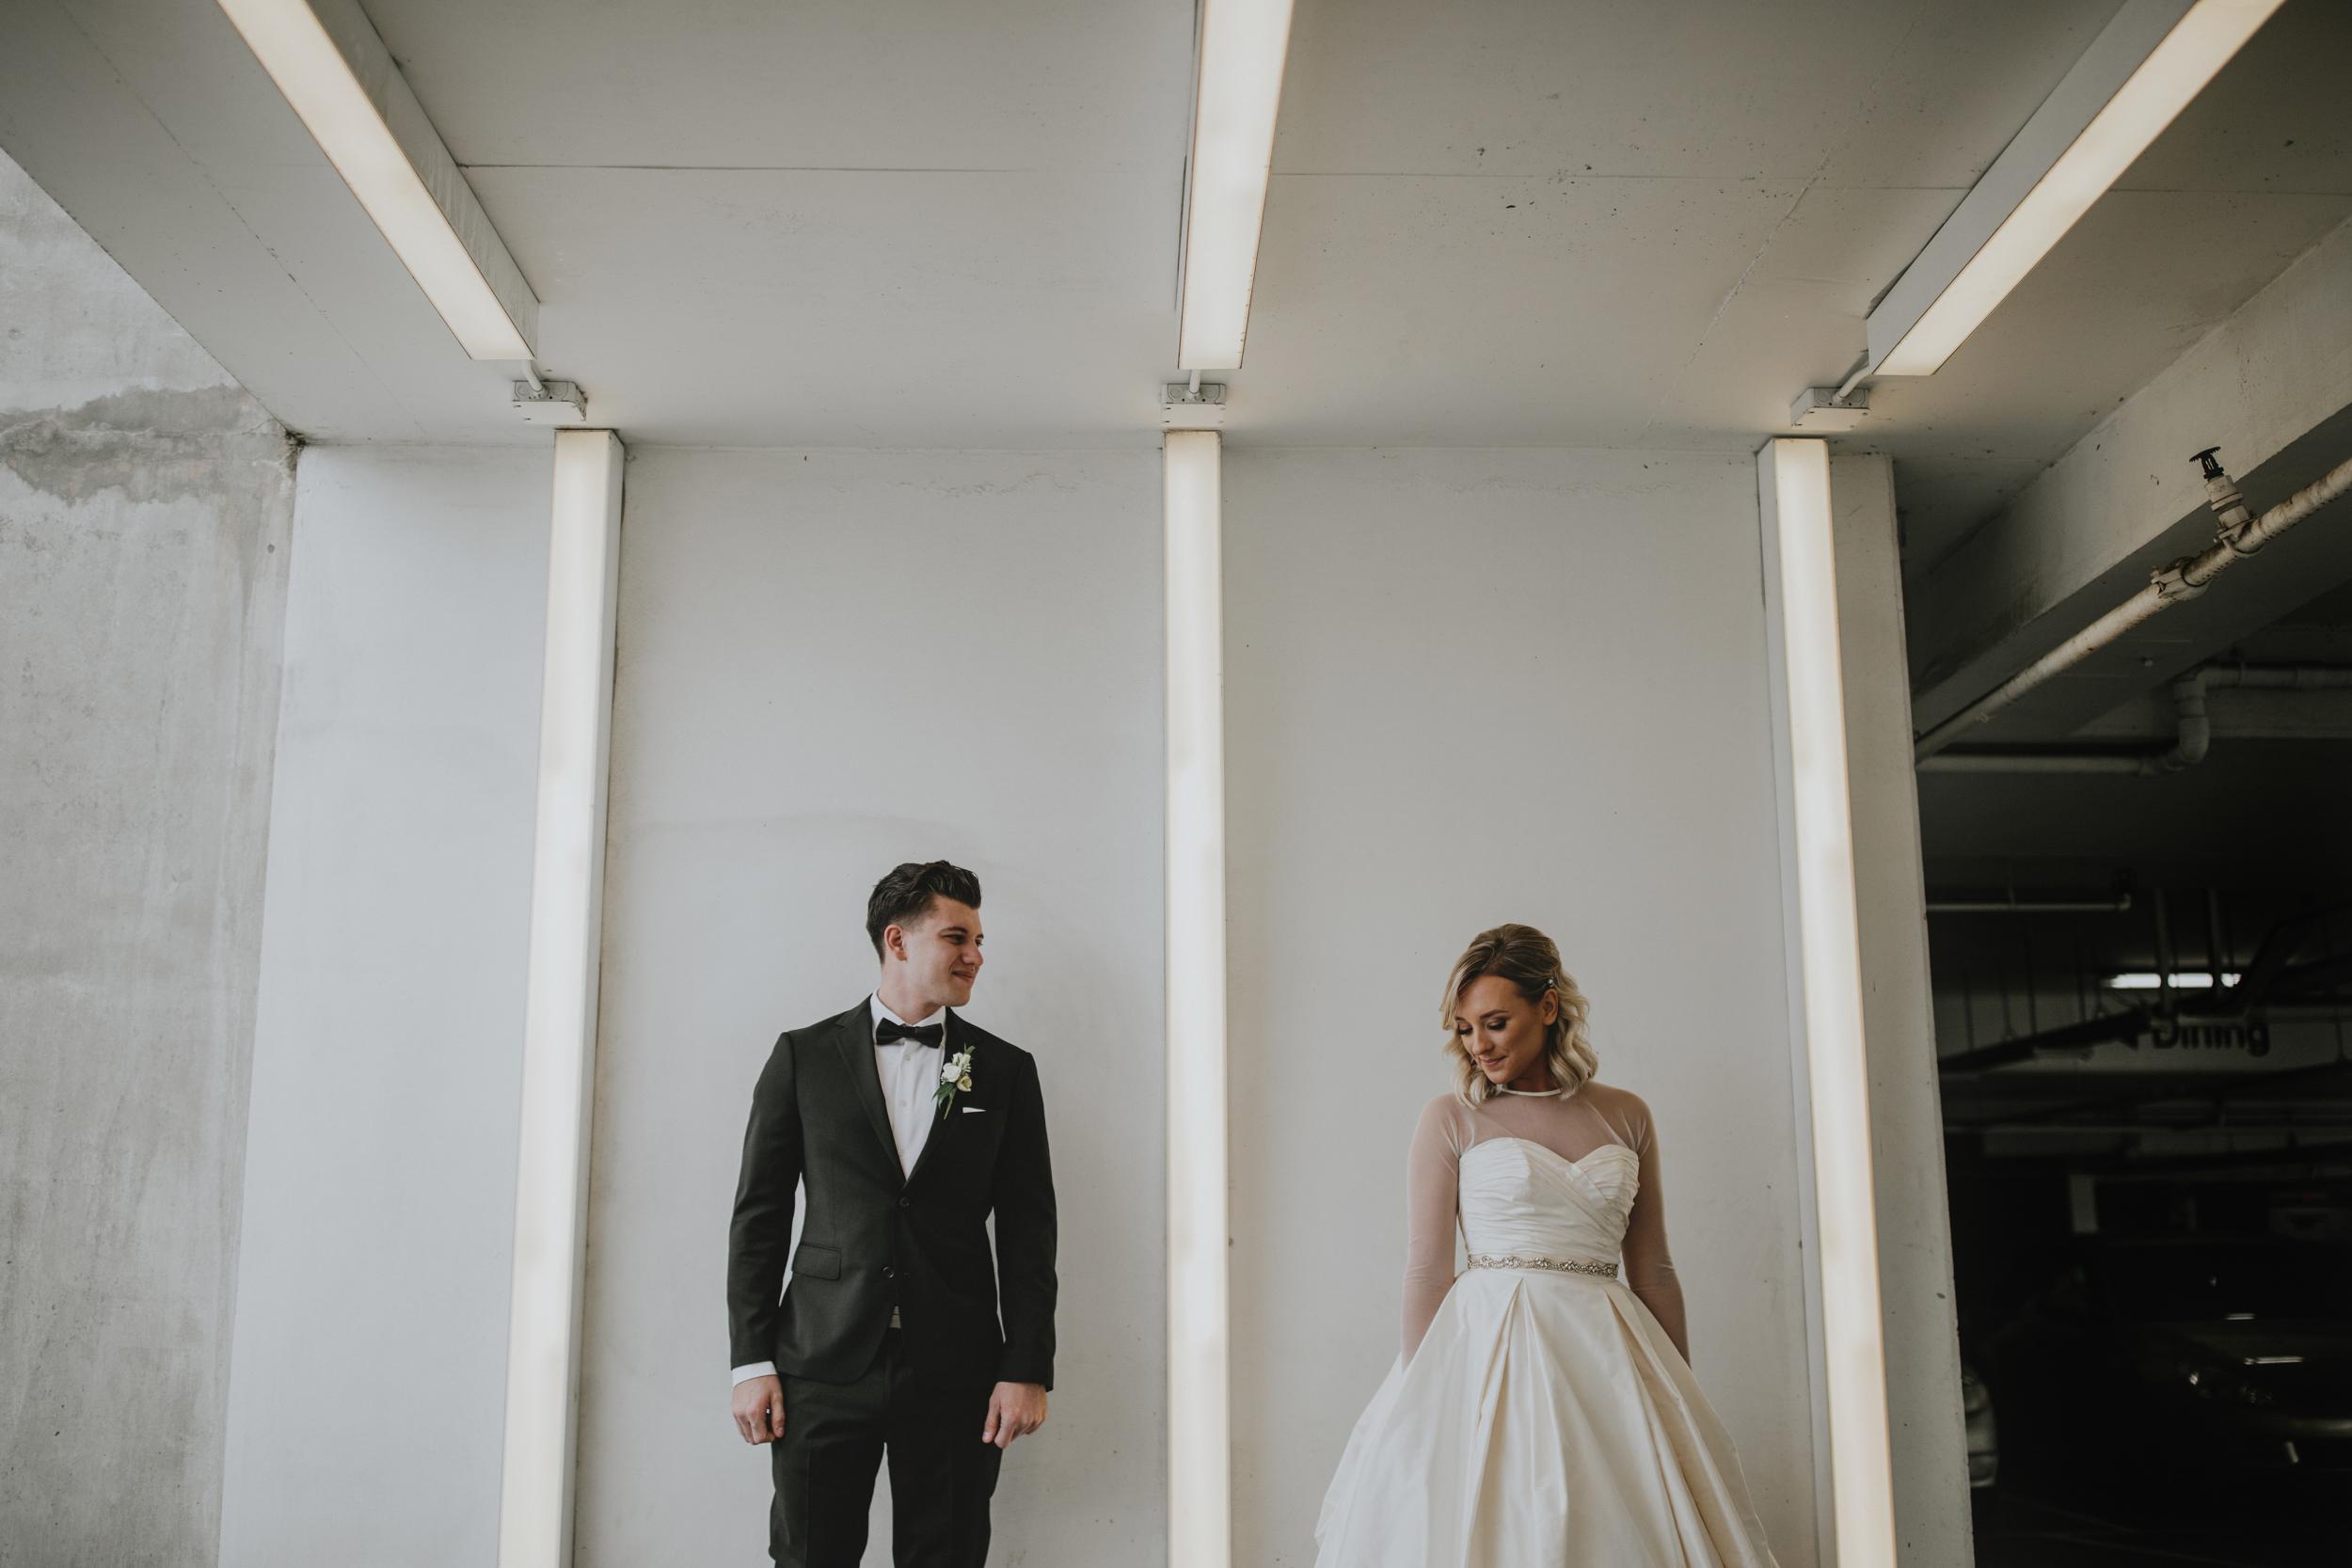 Airside-Spaces-Abbotsford-Wedding-9.jpg